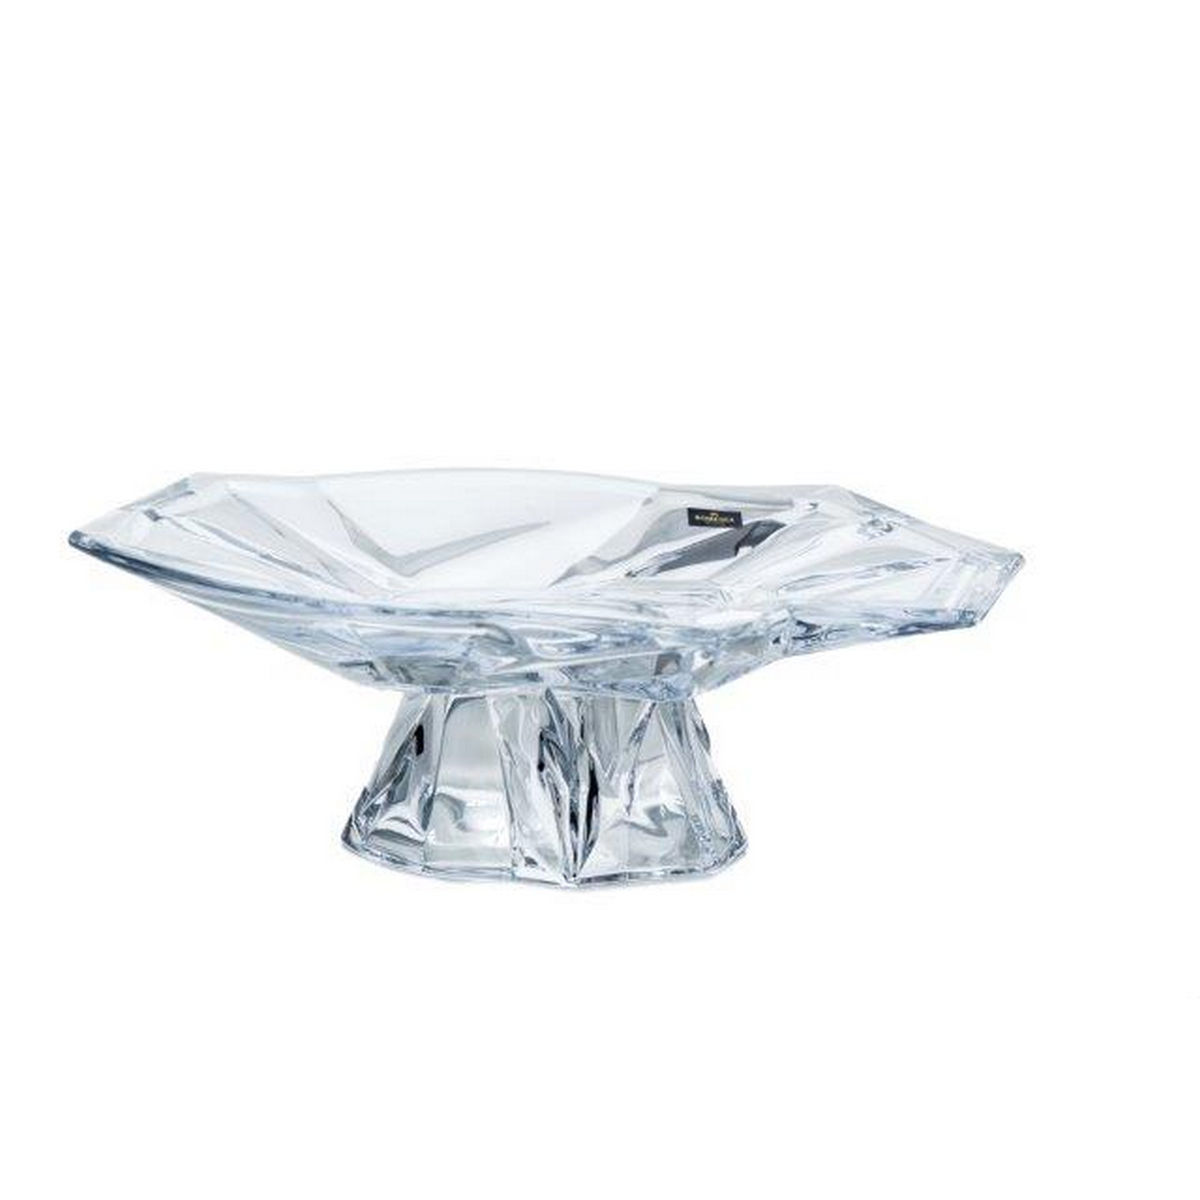 Angles Platou Cristalin Cu Picior 35.5 Cm 2021 aranjareamesei.ro